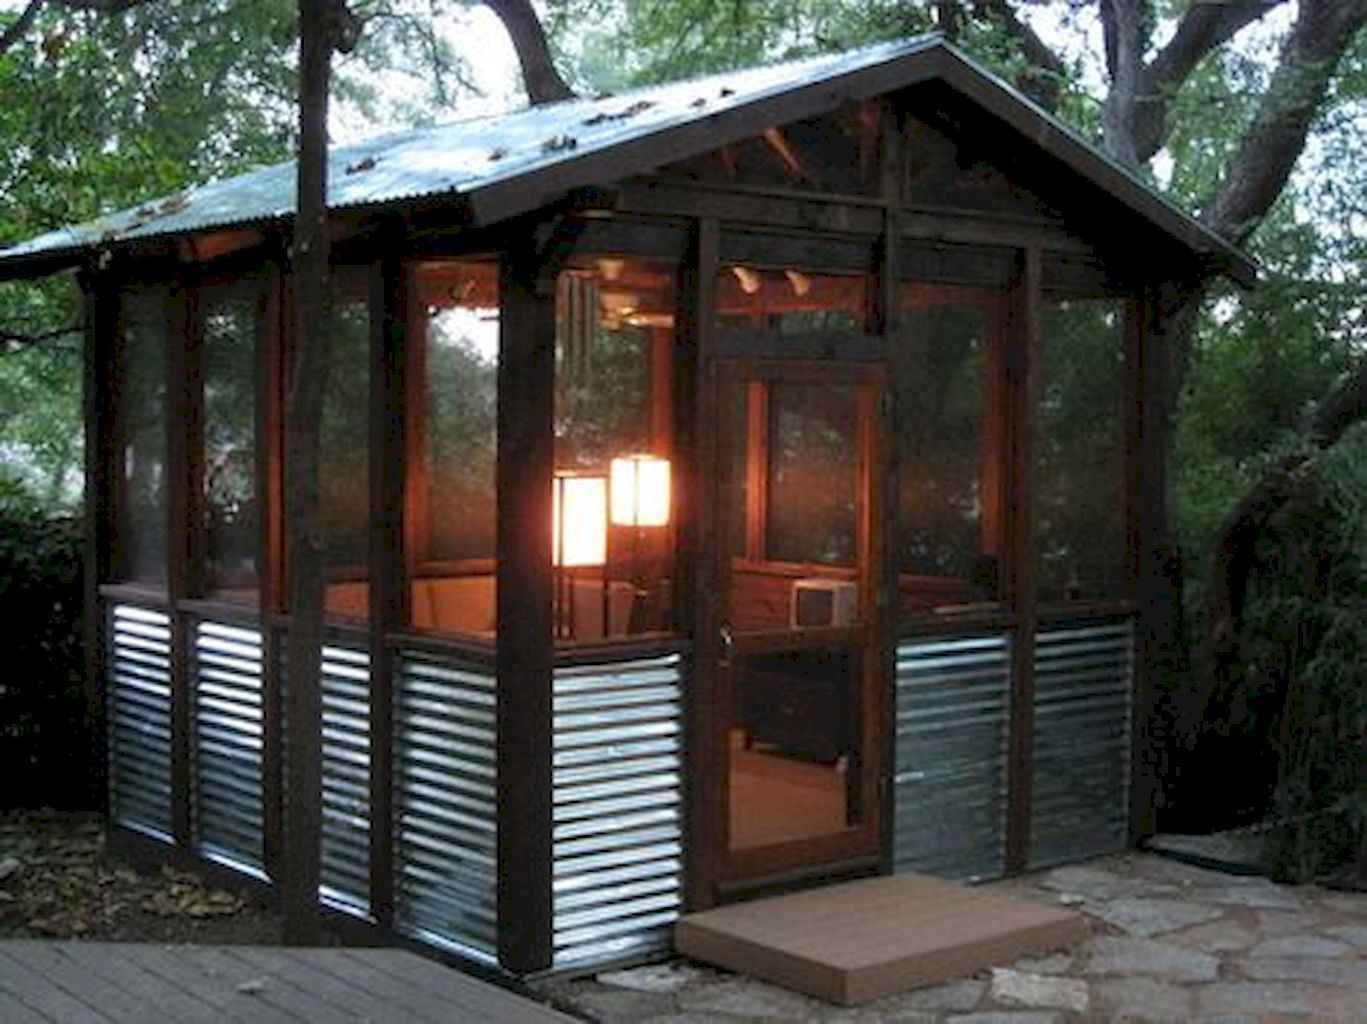 Cool diy backyard studio shed remodel design & decor ideas (17)